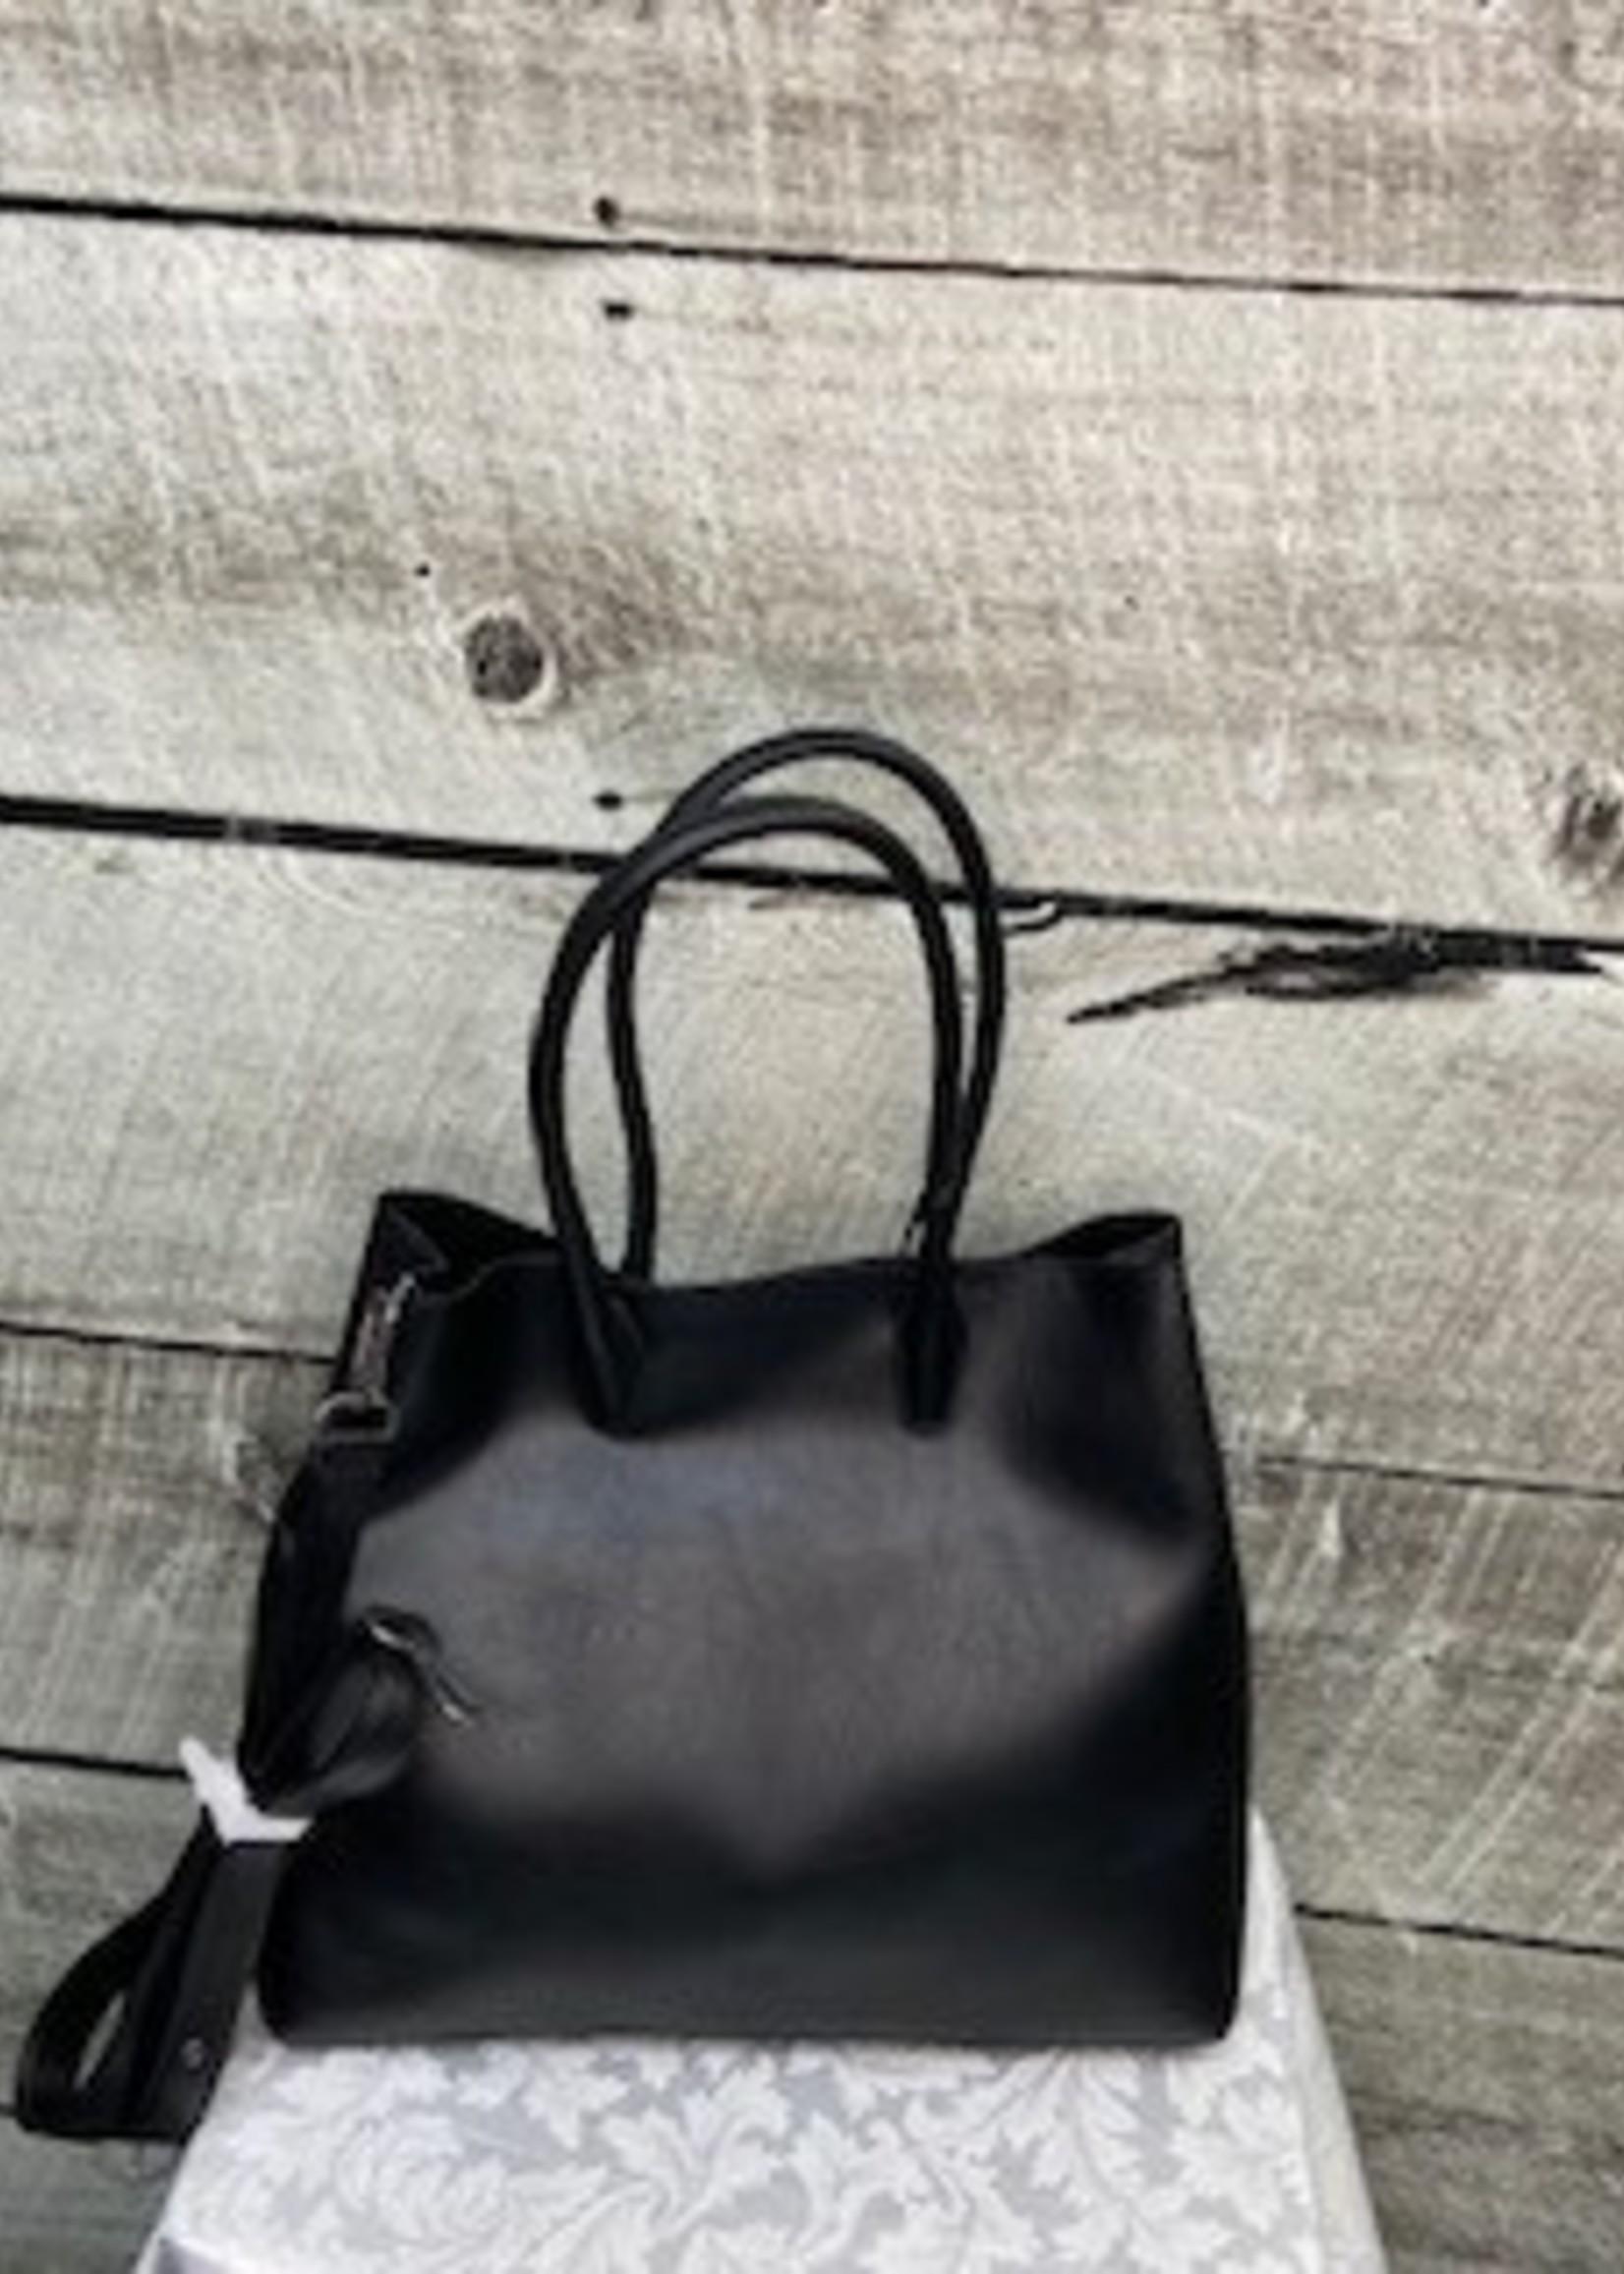 Matt & Nat Matt Nat lg purse Krista black